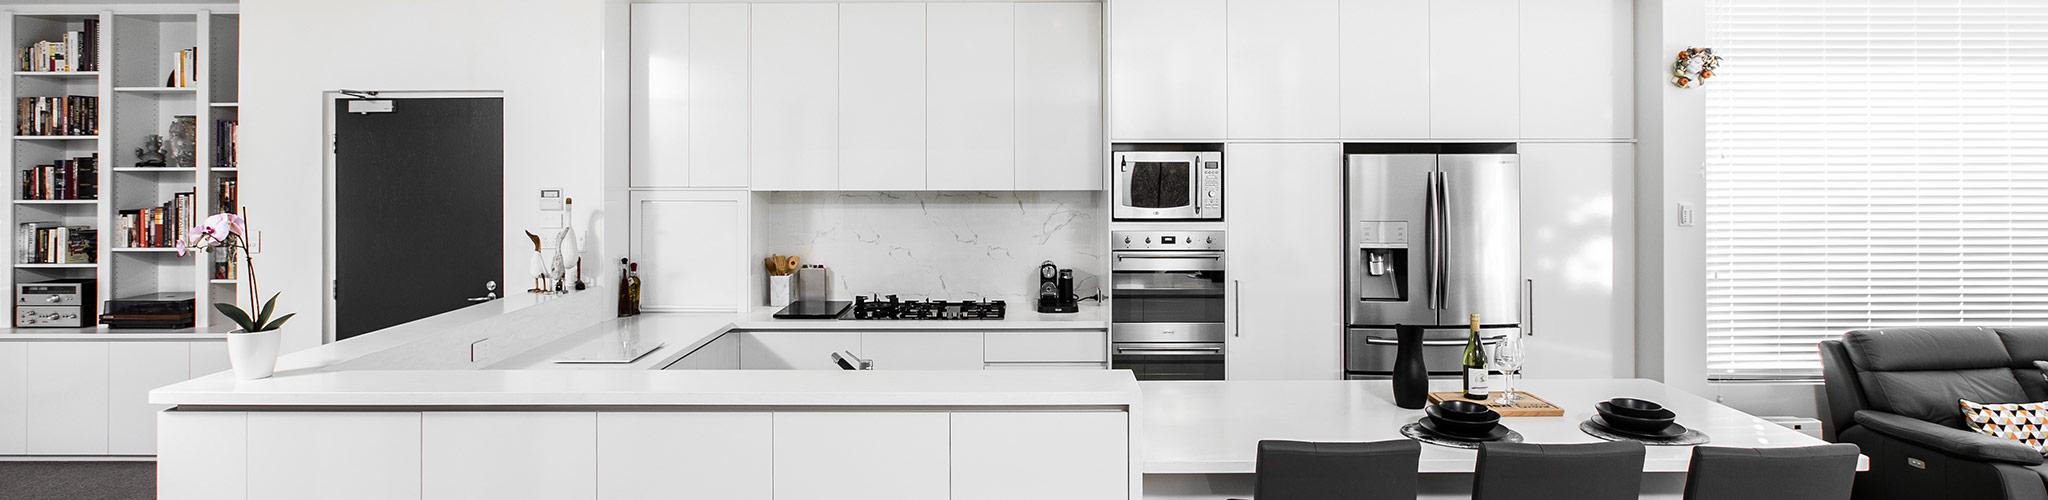 entertainer perth kitchen renovations flexi kitchens